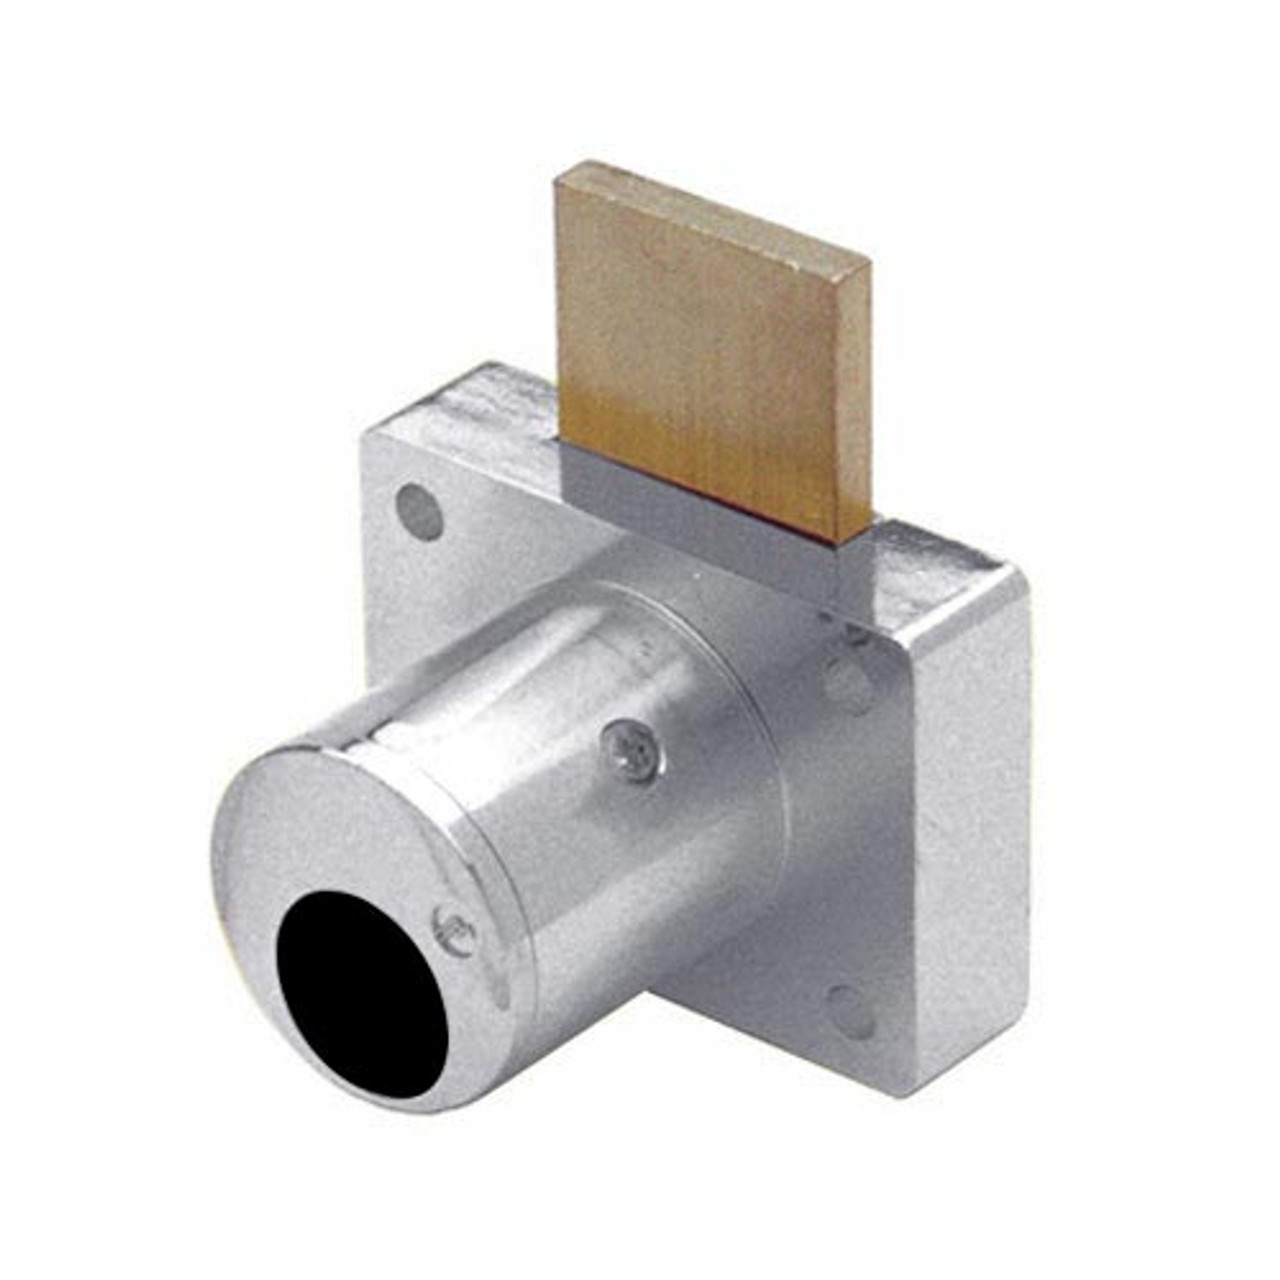 Olympus 800LCA-26D Cabinet Drawer Deadbolt Less Cylinder Assa Lock in Satin Chrome